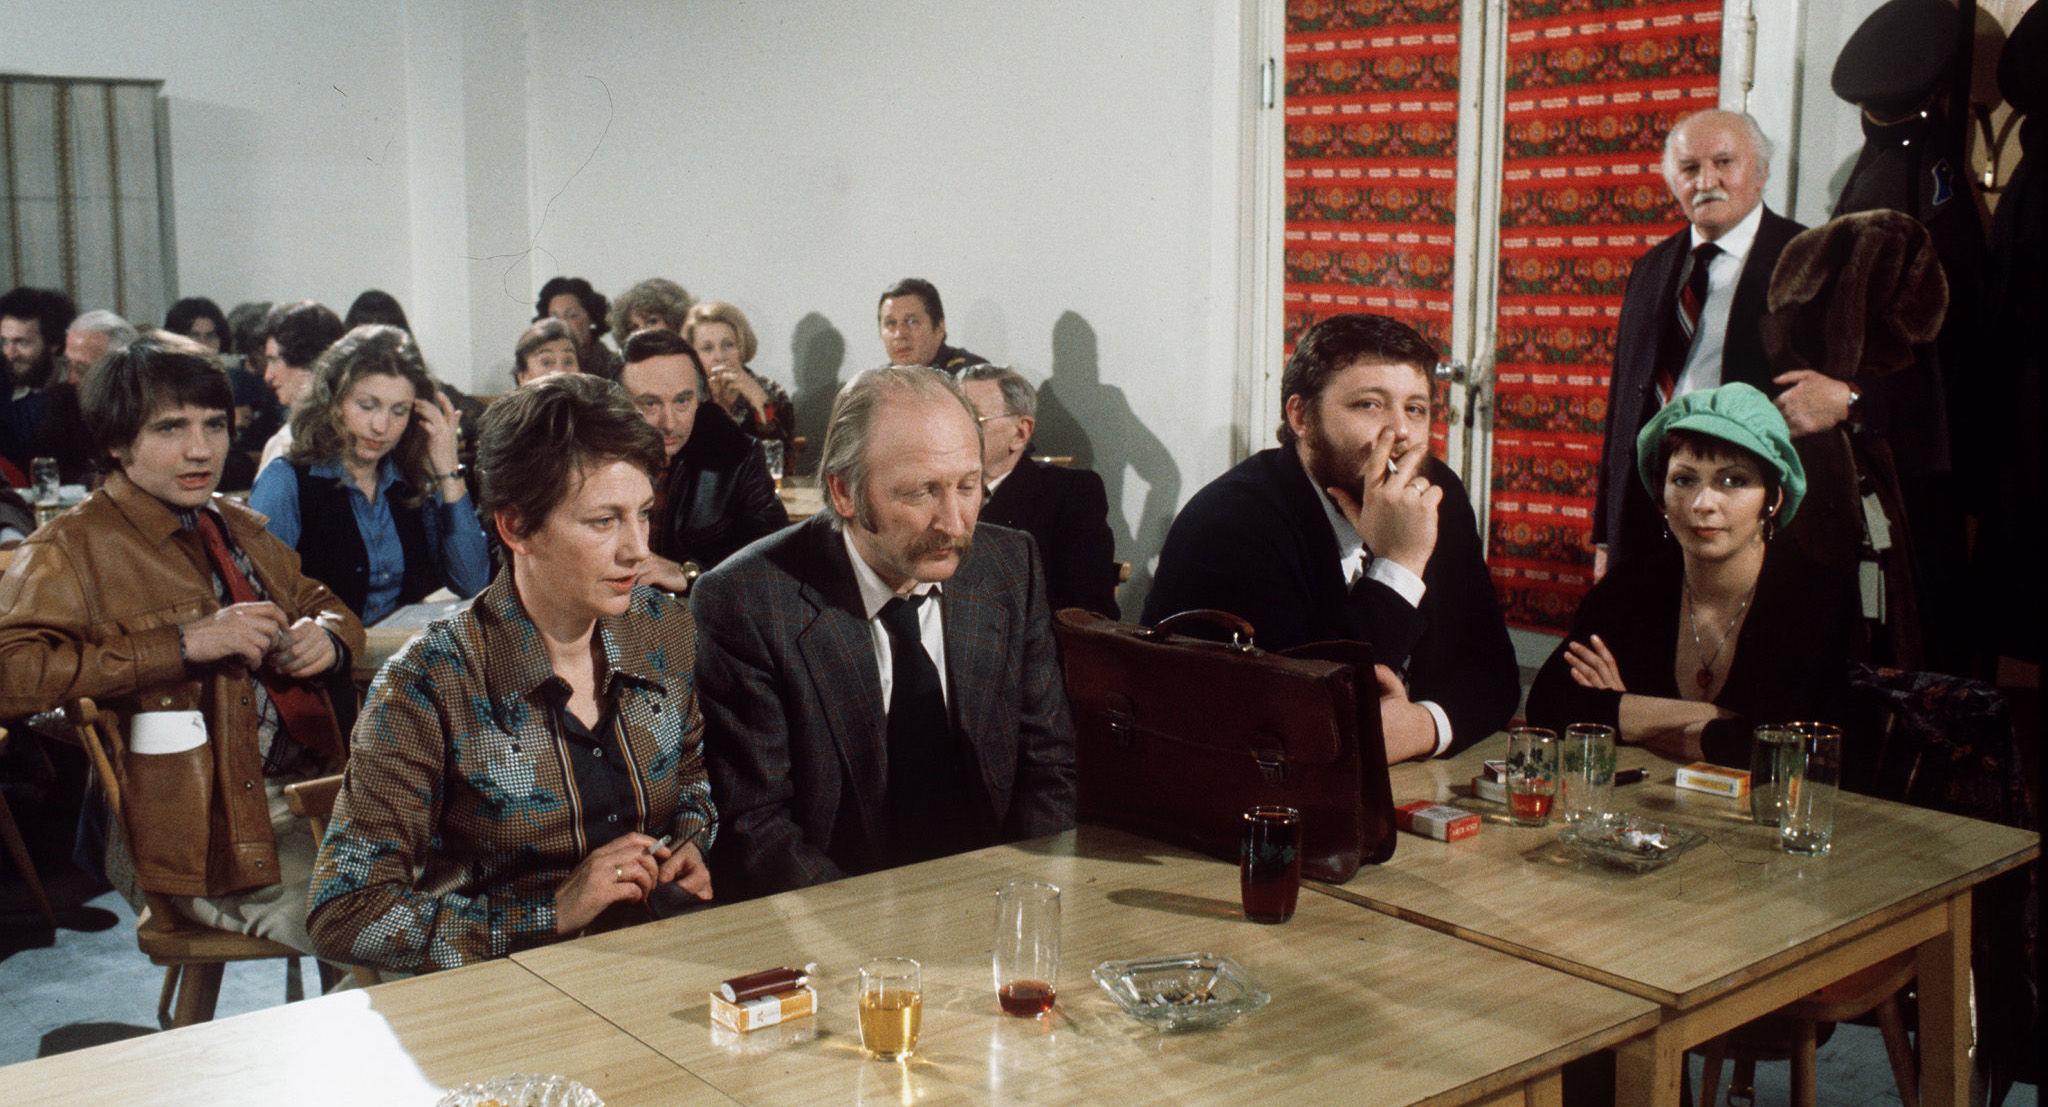 Karli (Klaus Rott), Irmi (Liliana Nelska), Toni (Ingrid Burkhard), Mundl (Karl Merkatz), Kurti (Götz Kauffmann), Fini (Dolores Schmiedinger)